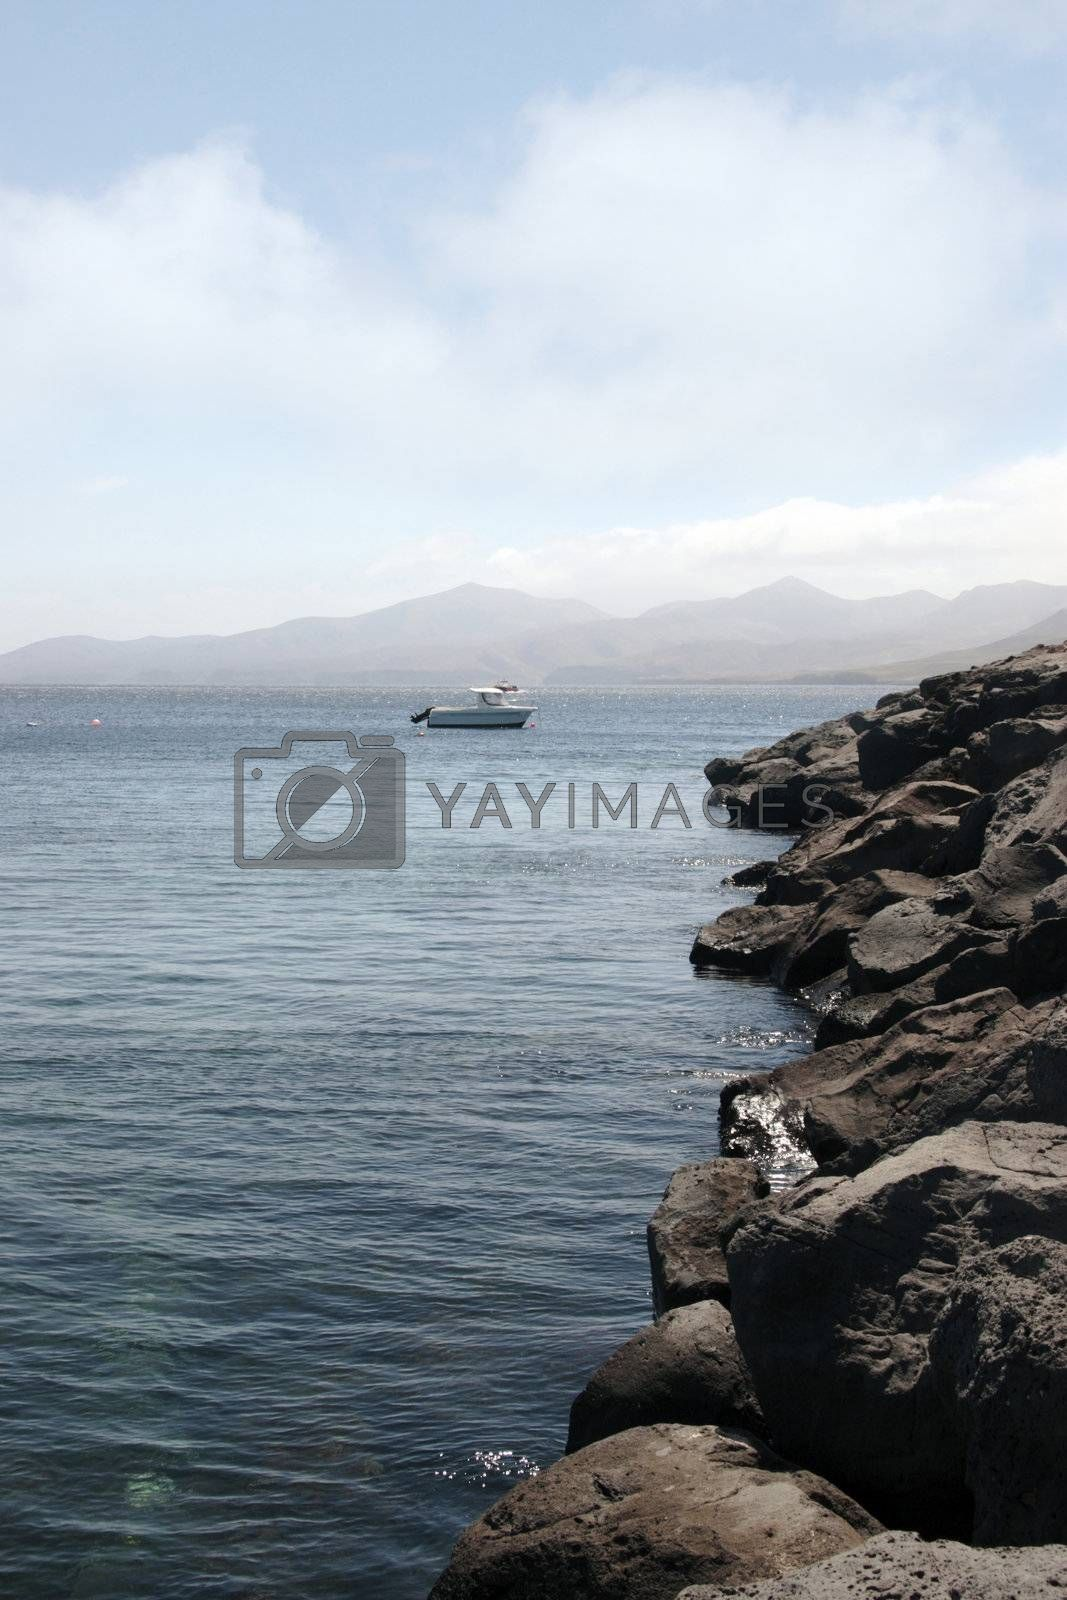 a motor boat in clear blue waters